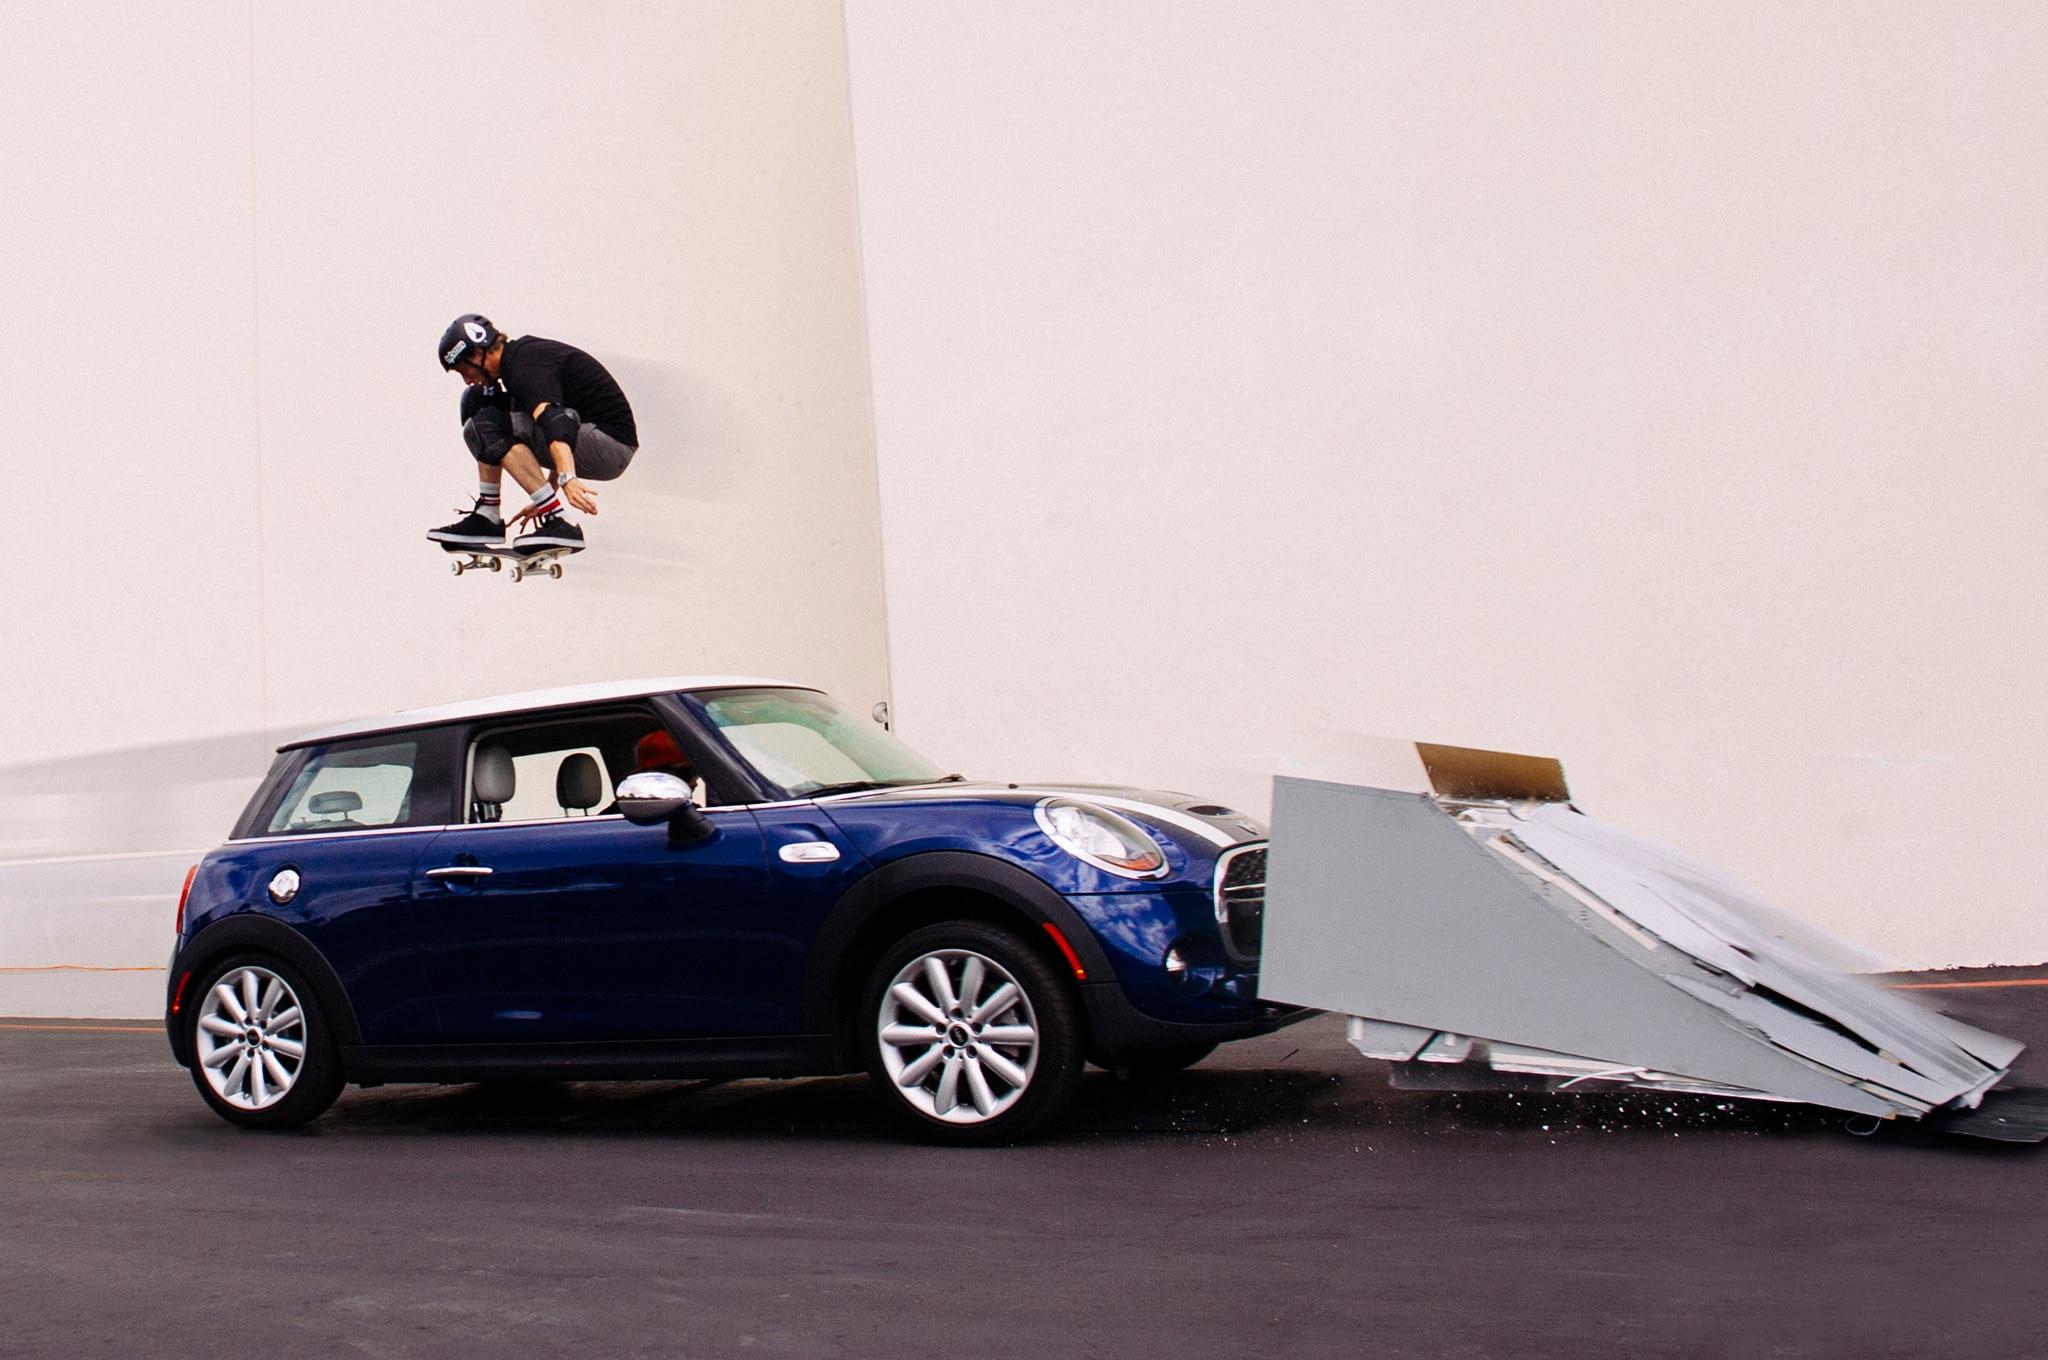 2014 Mini Cooper S Tony Hawk Jump1